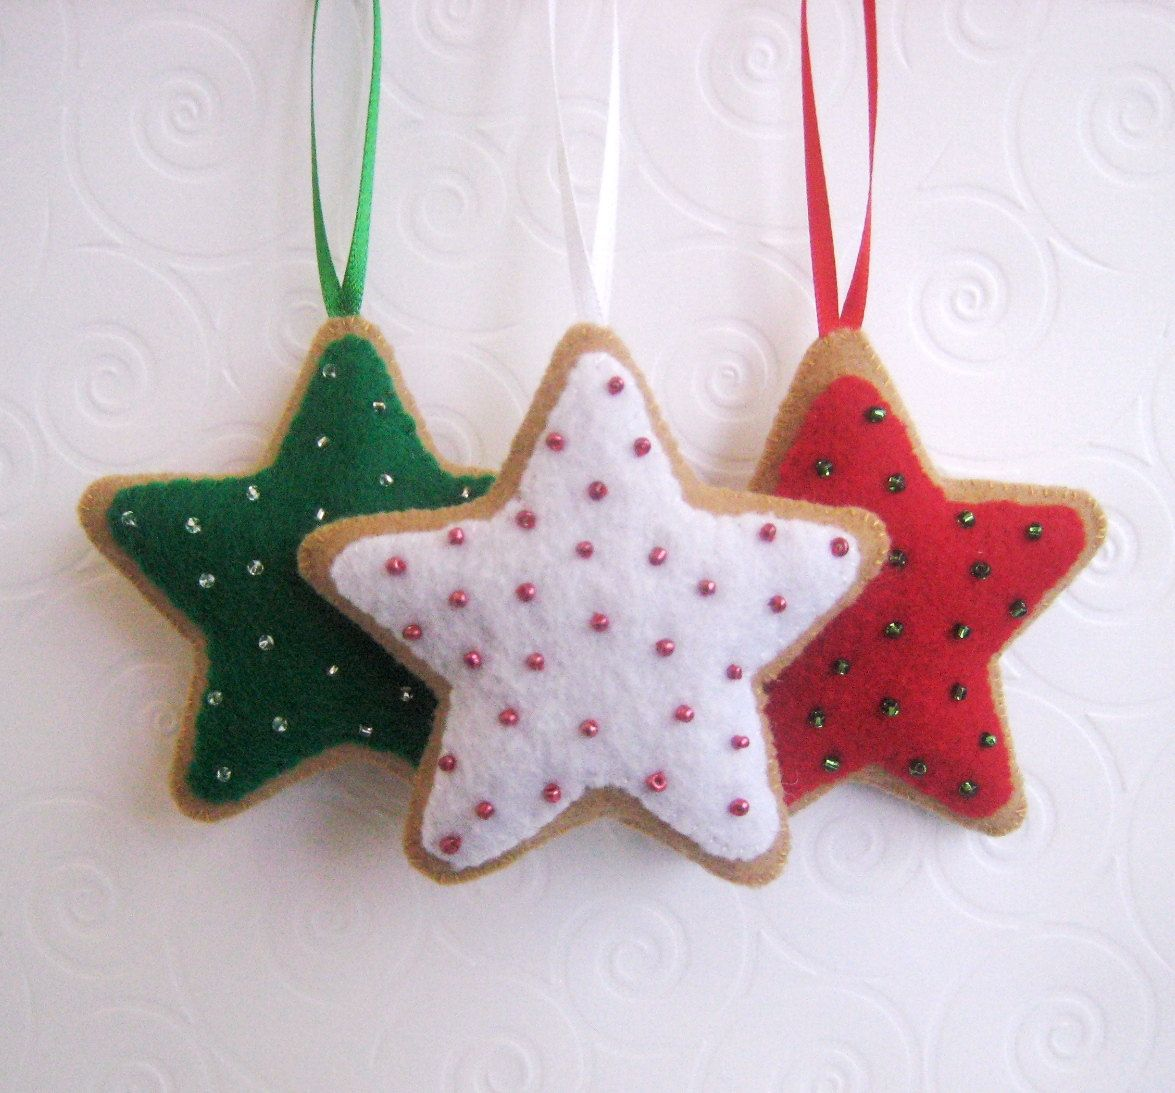 Felt Ornaments Three Traditional Star Christmas Cookies Felt